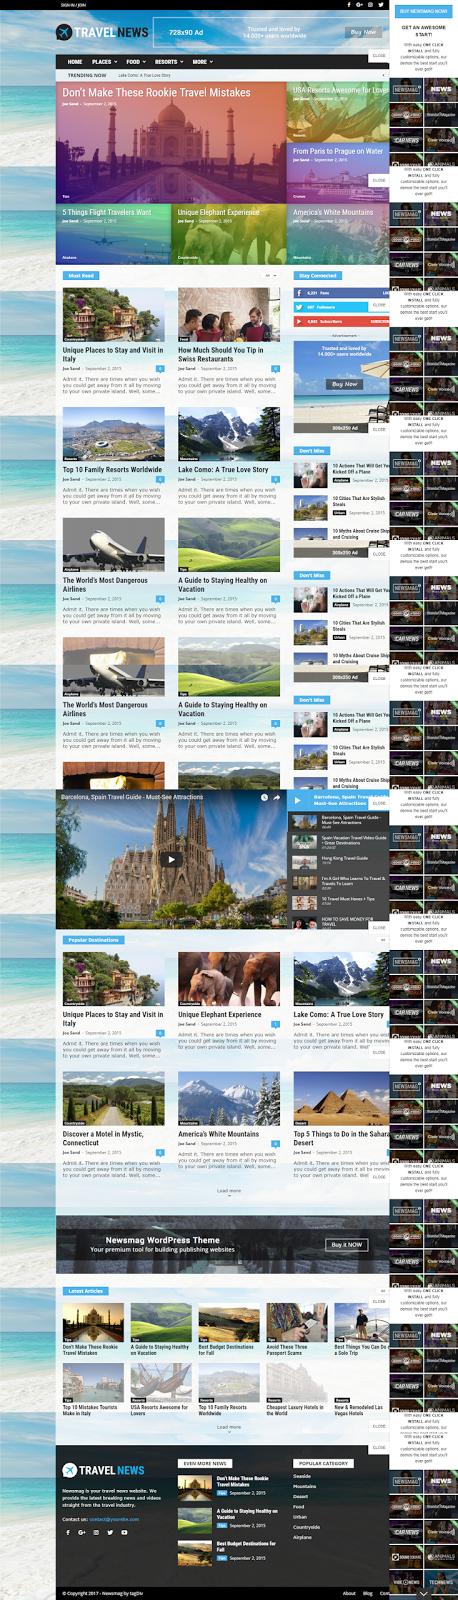 Travel News Magazine